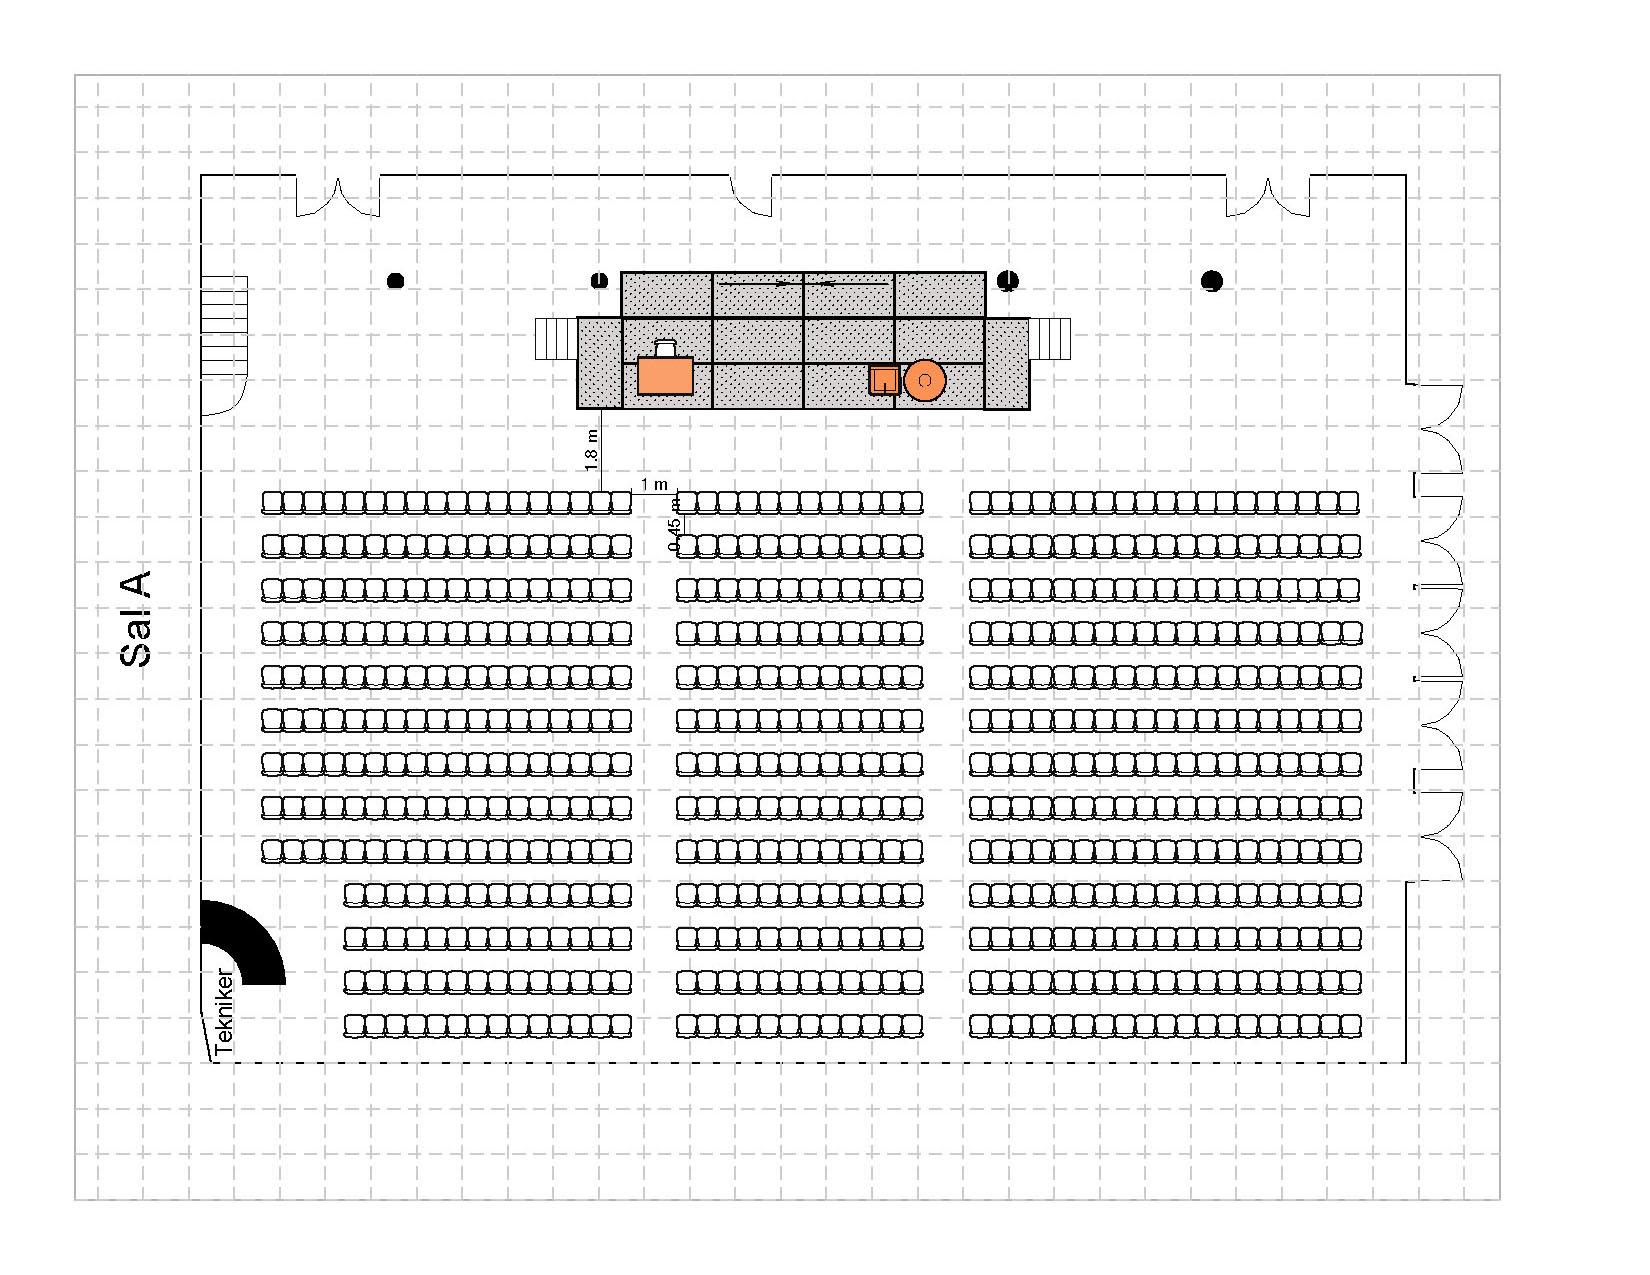 Kino 621 plasser